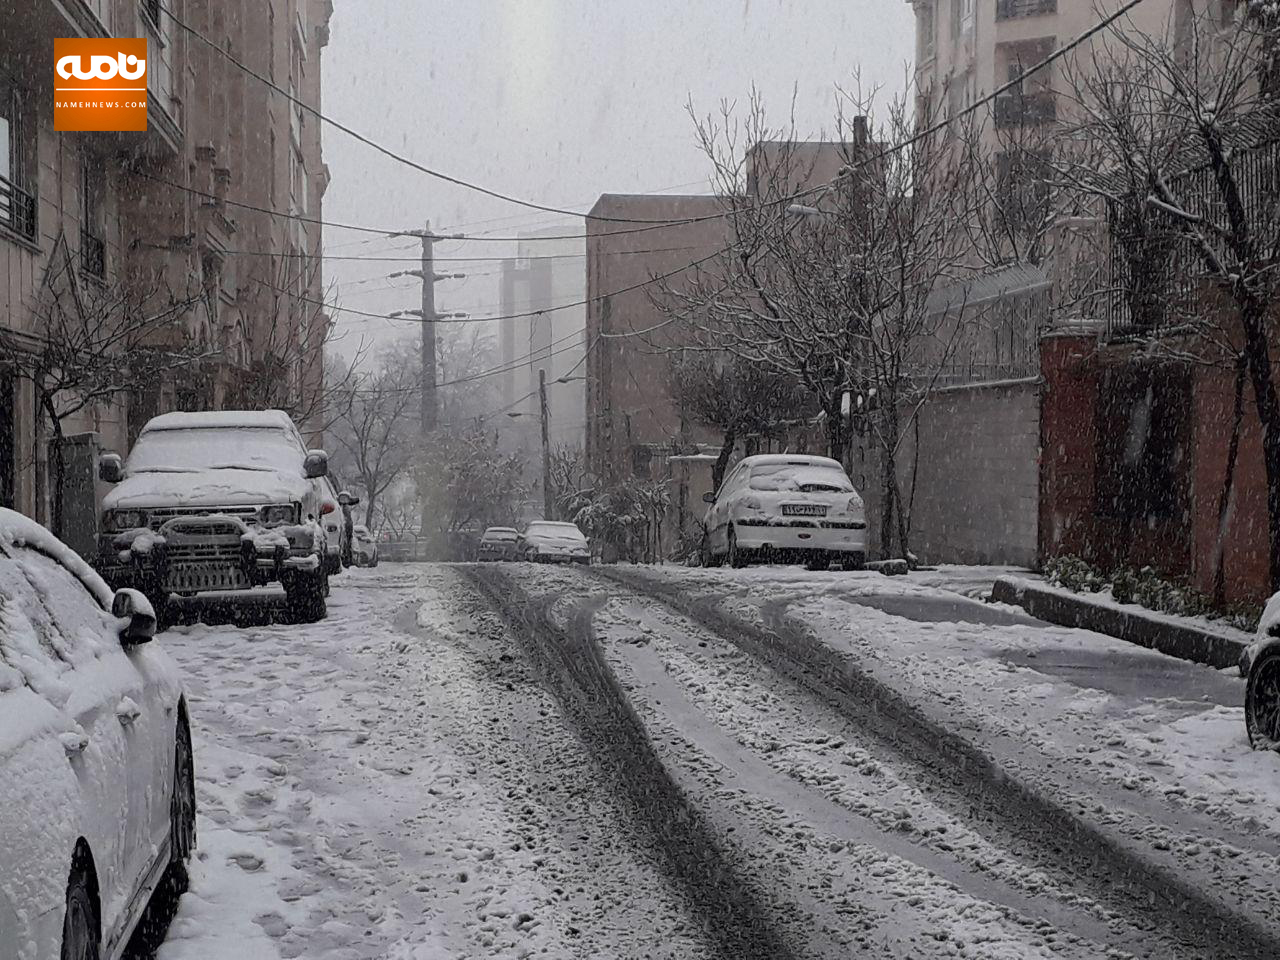 عکس خبري -عکس / بارش برف در تهران - هم اکنون